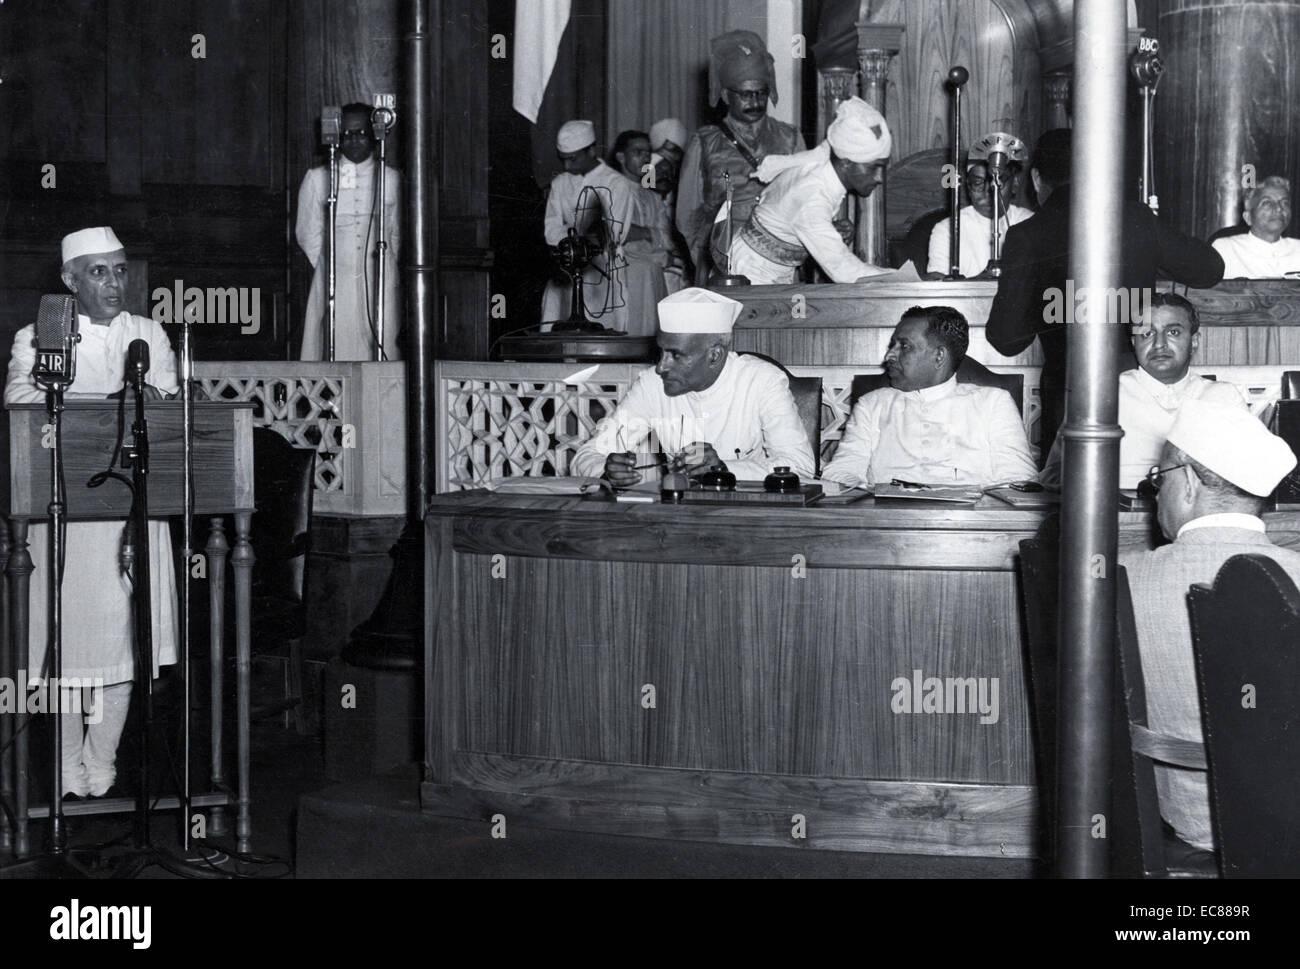 Photograph of Jawaharlal Nehru - Stock Image